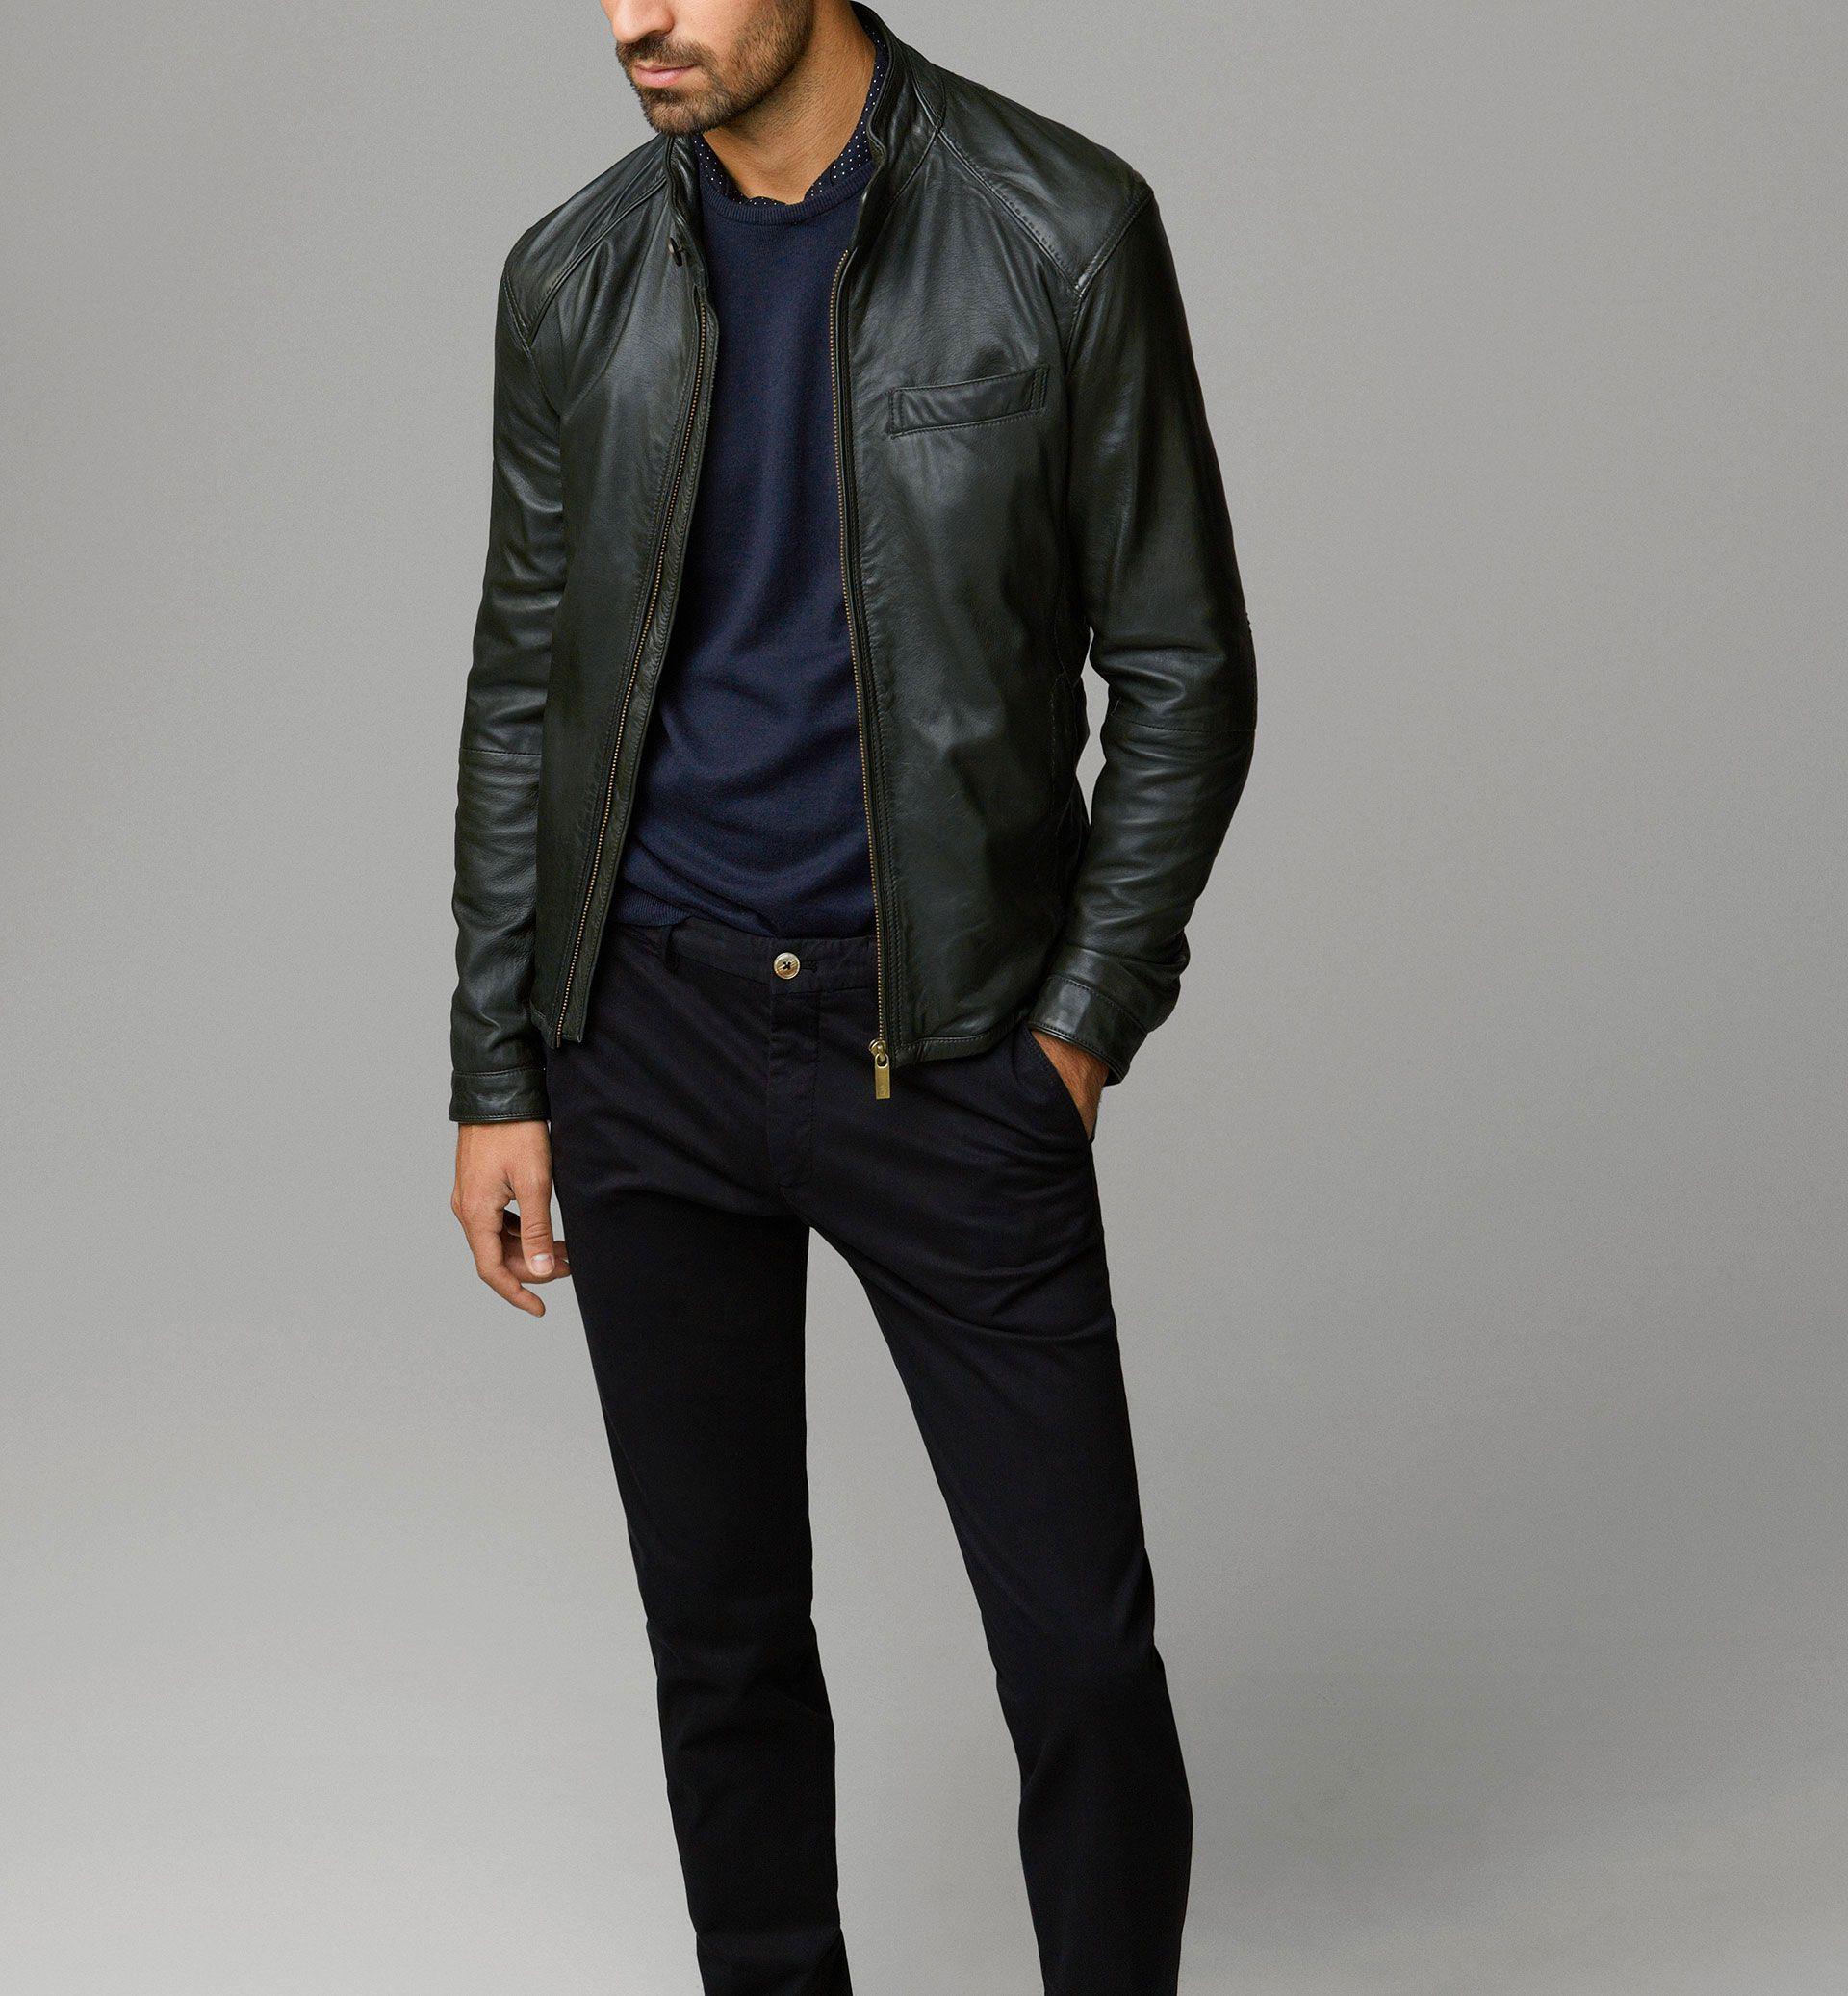 Men's jacket collar - Nappa Leather Jacket With Mandarin Collar